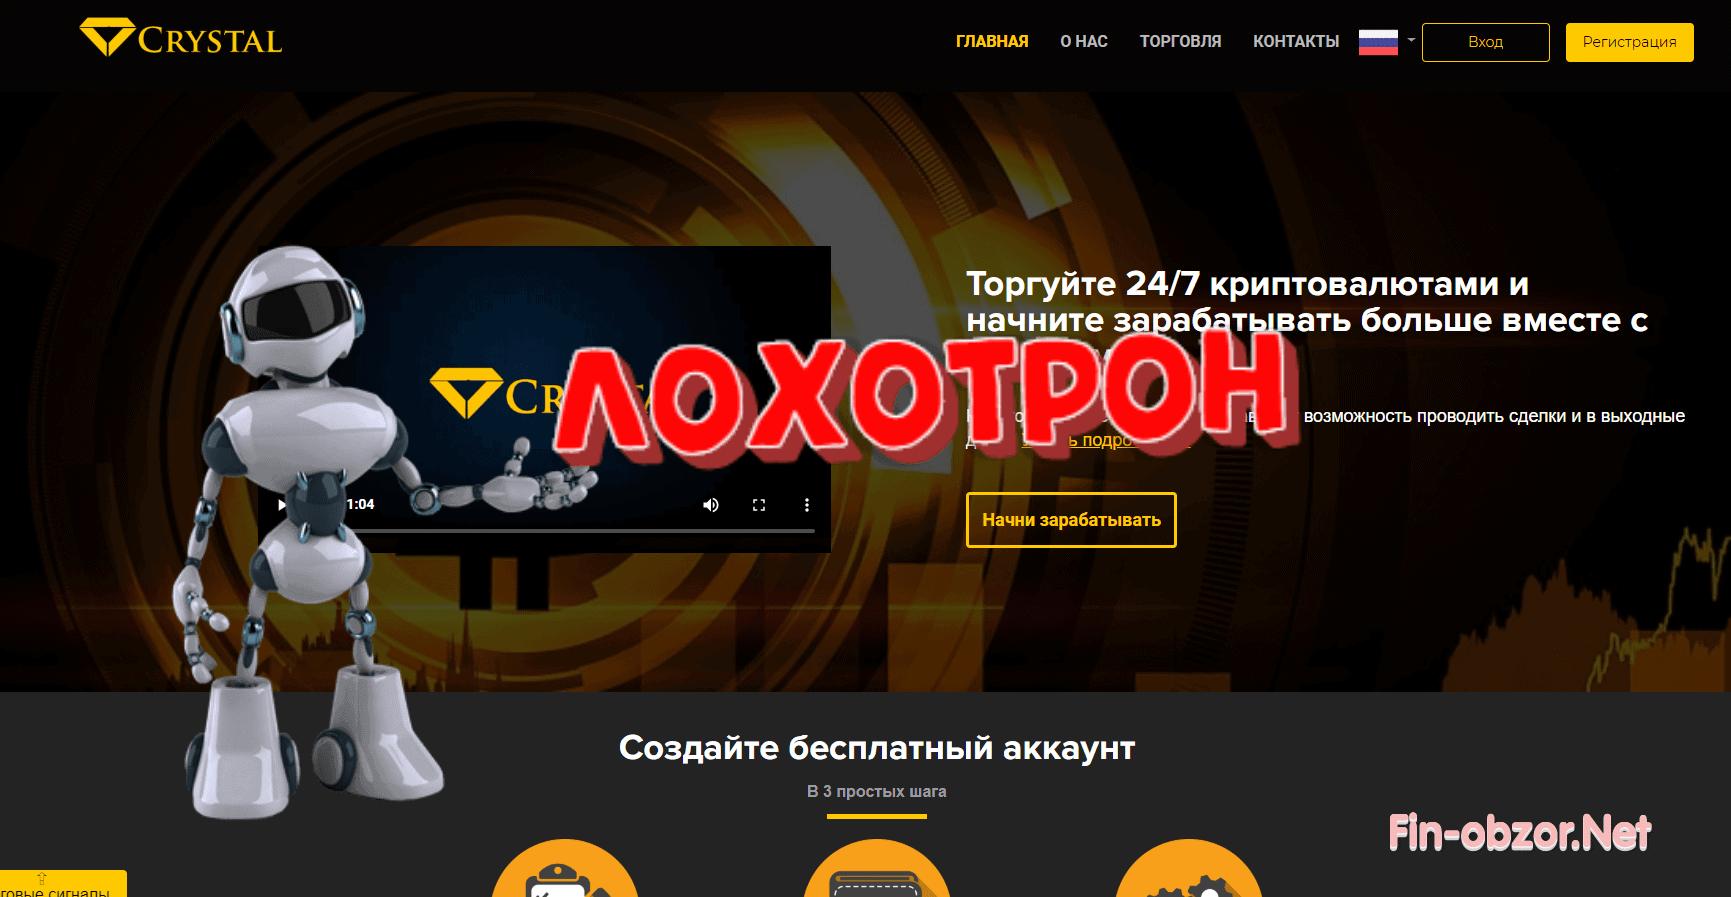 ProfitCrystal (profitcrystal.com) отзывы. Развод